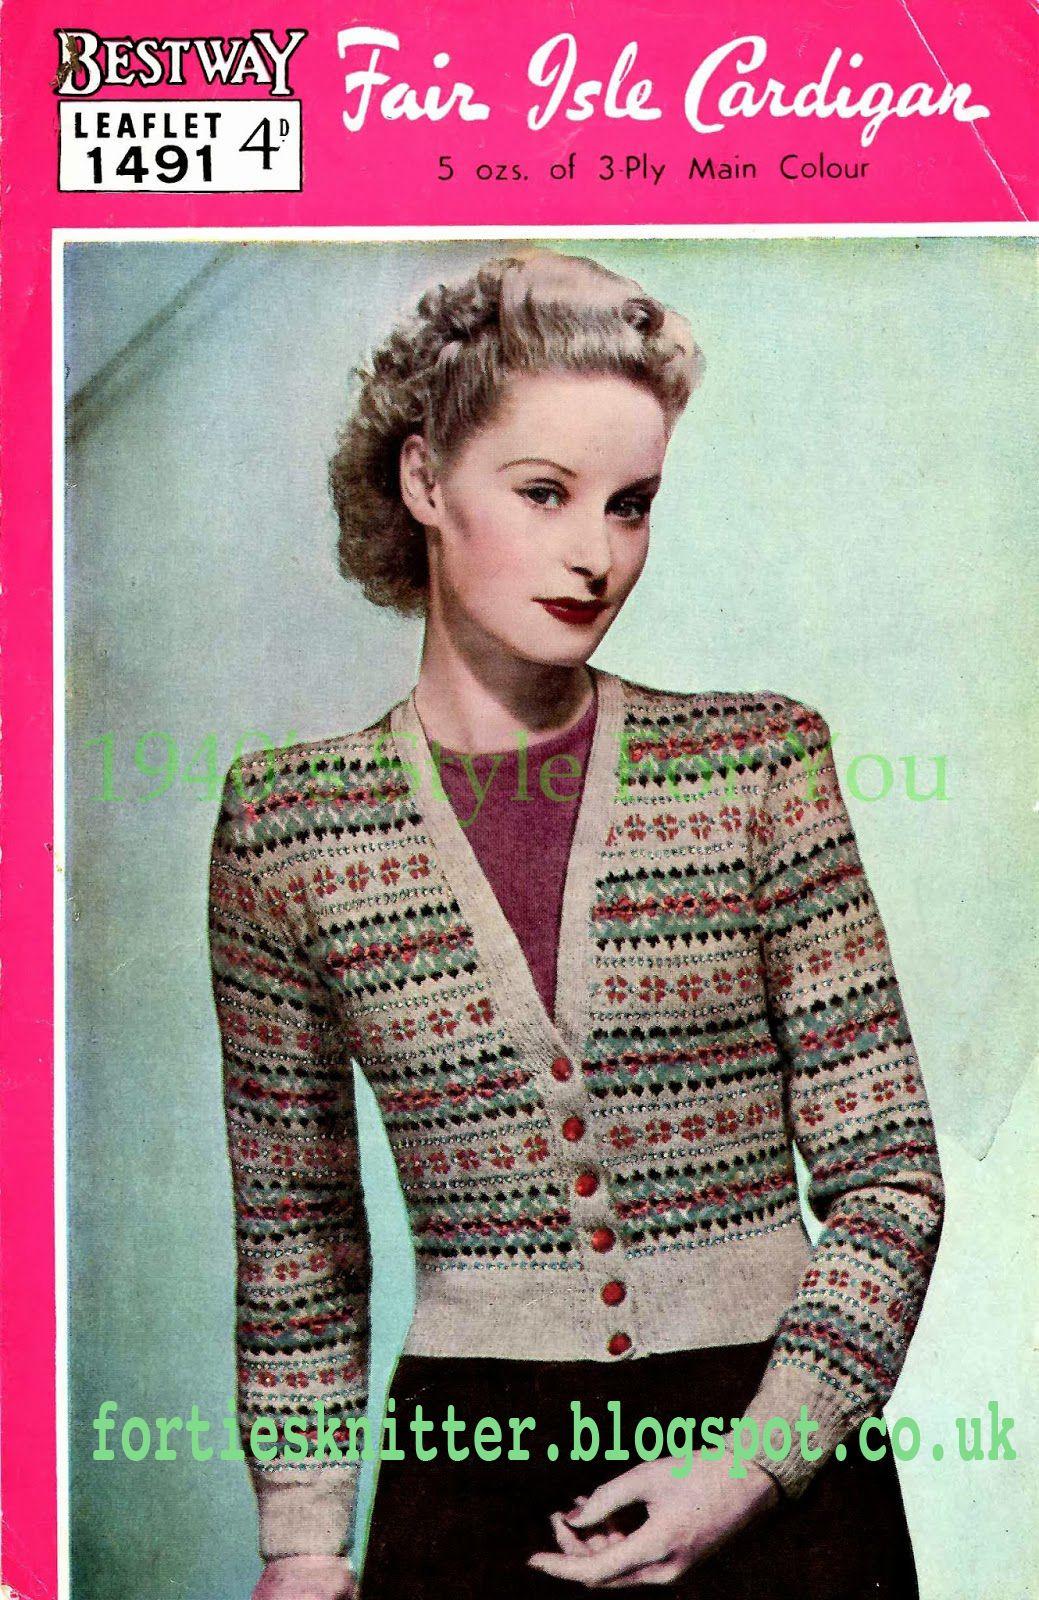 1940s knitting bestway no1491 fair isle cardigan free knitting 1940s knitting bestway no1491 fair isle cardigan free knitting pattern bankloansurffo Image collections